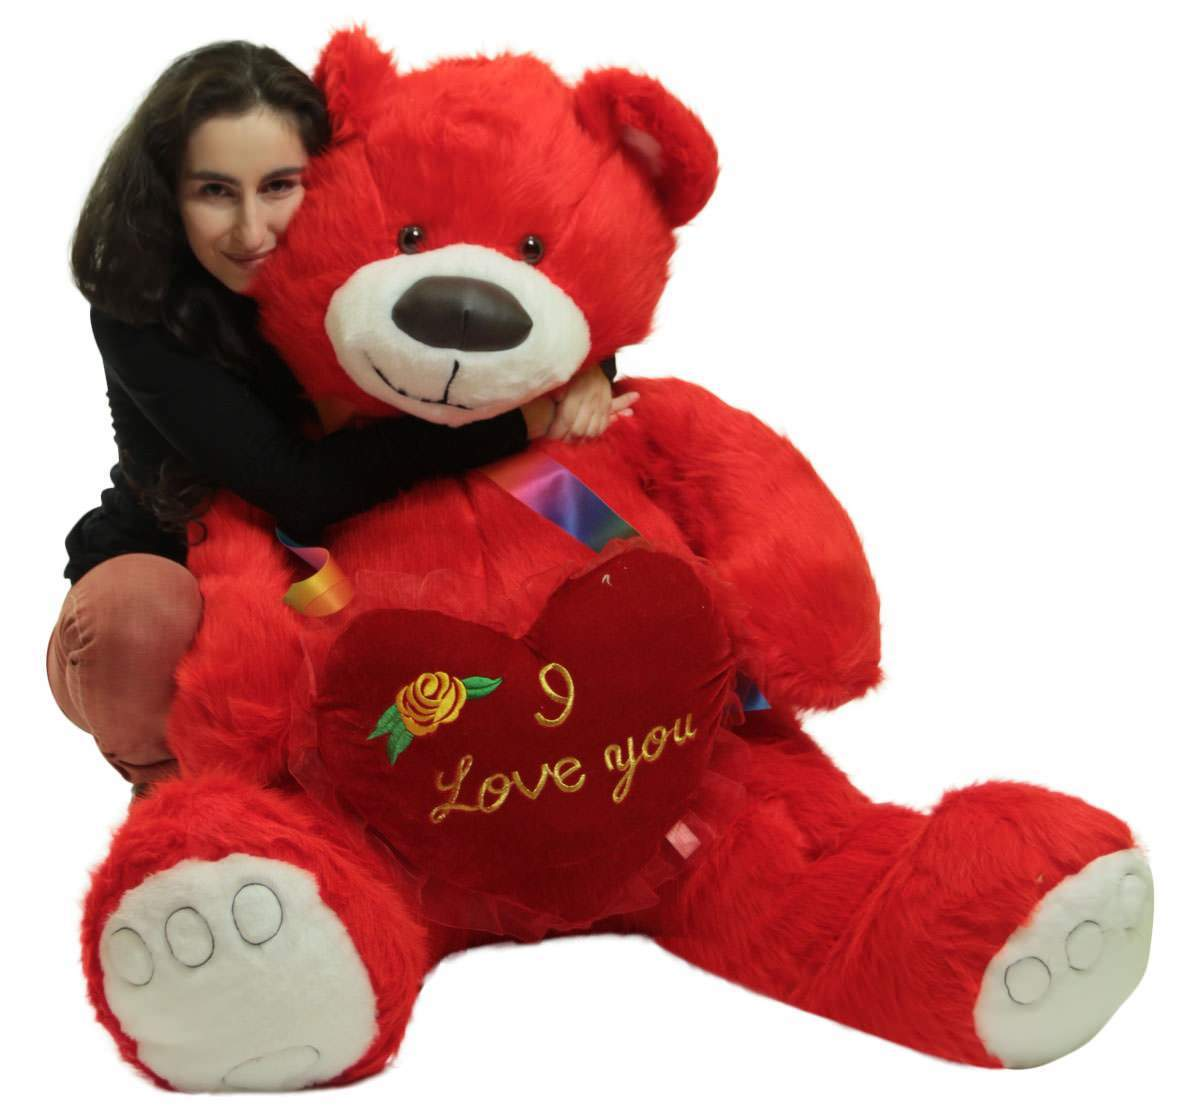 Red Teddy Bear 5 Feet, Life Size 5 Foot Red Teddy Bear With I Love You Heart Pillow Big Plush Soft Stuffed Animal Made In Usa Walmart Com Walmart Com